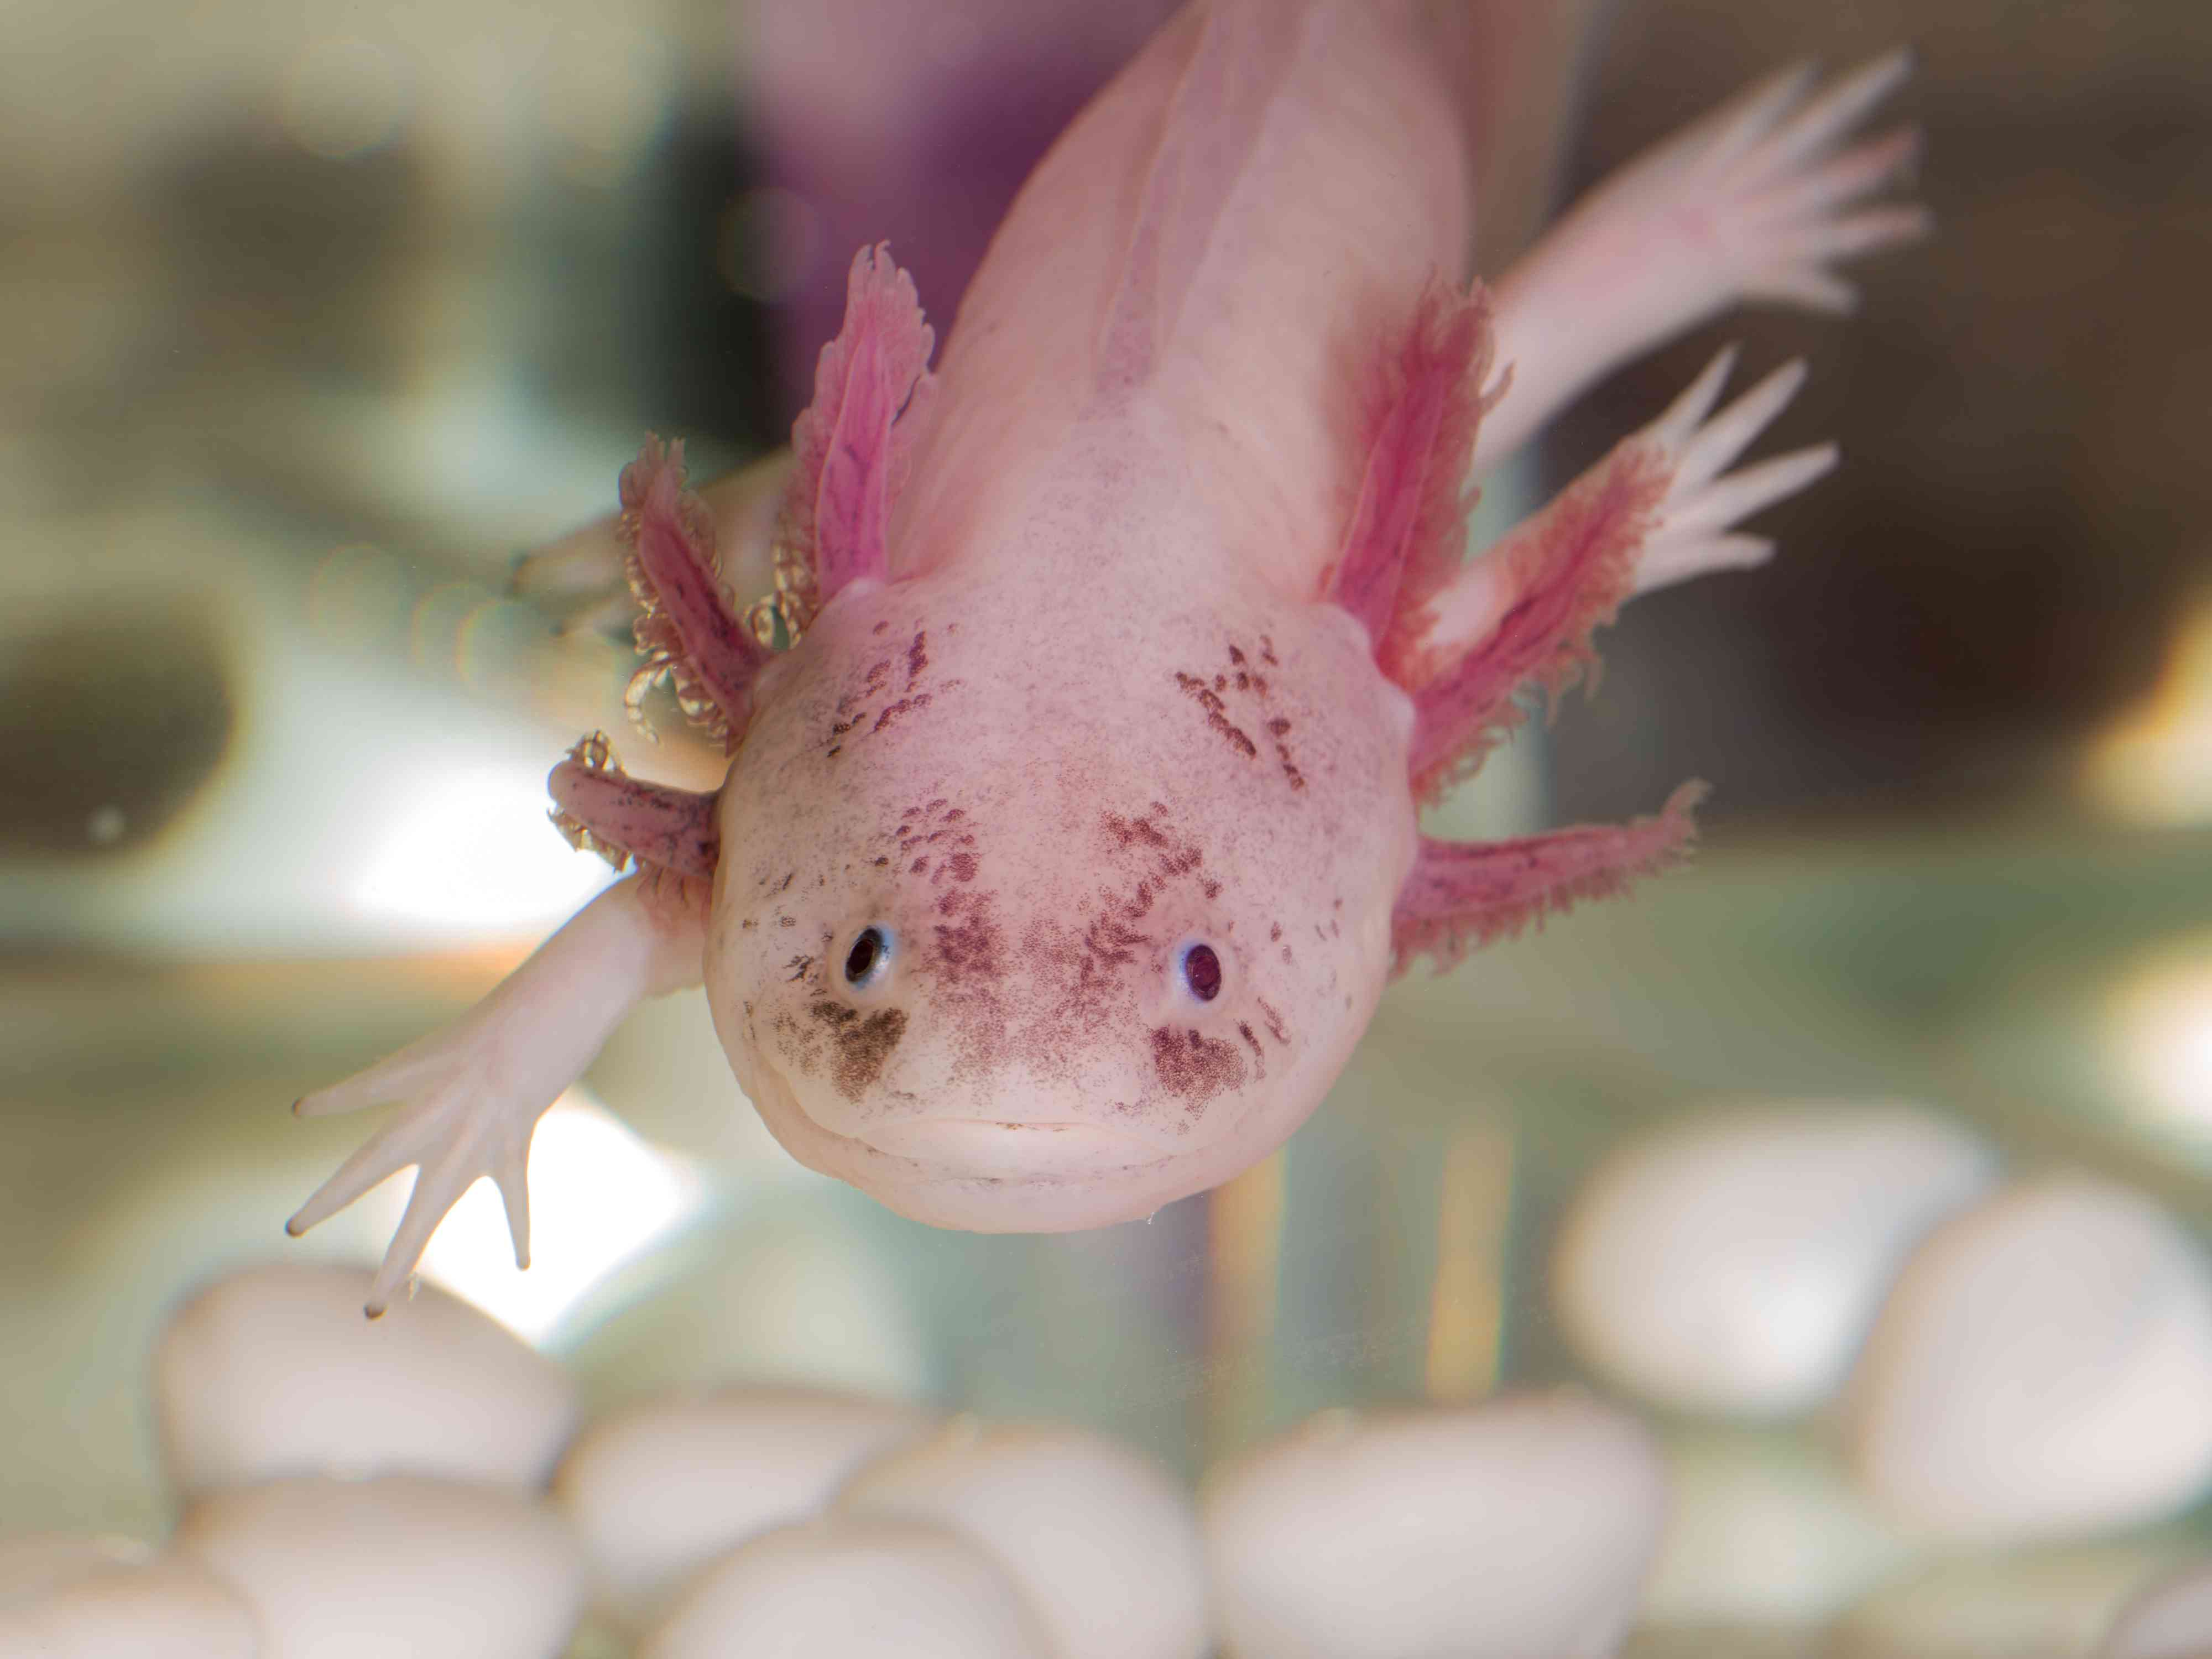 Portrait of an axolotl